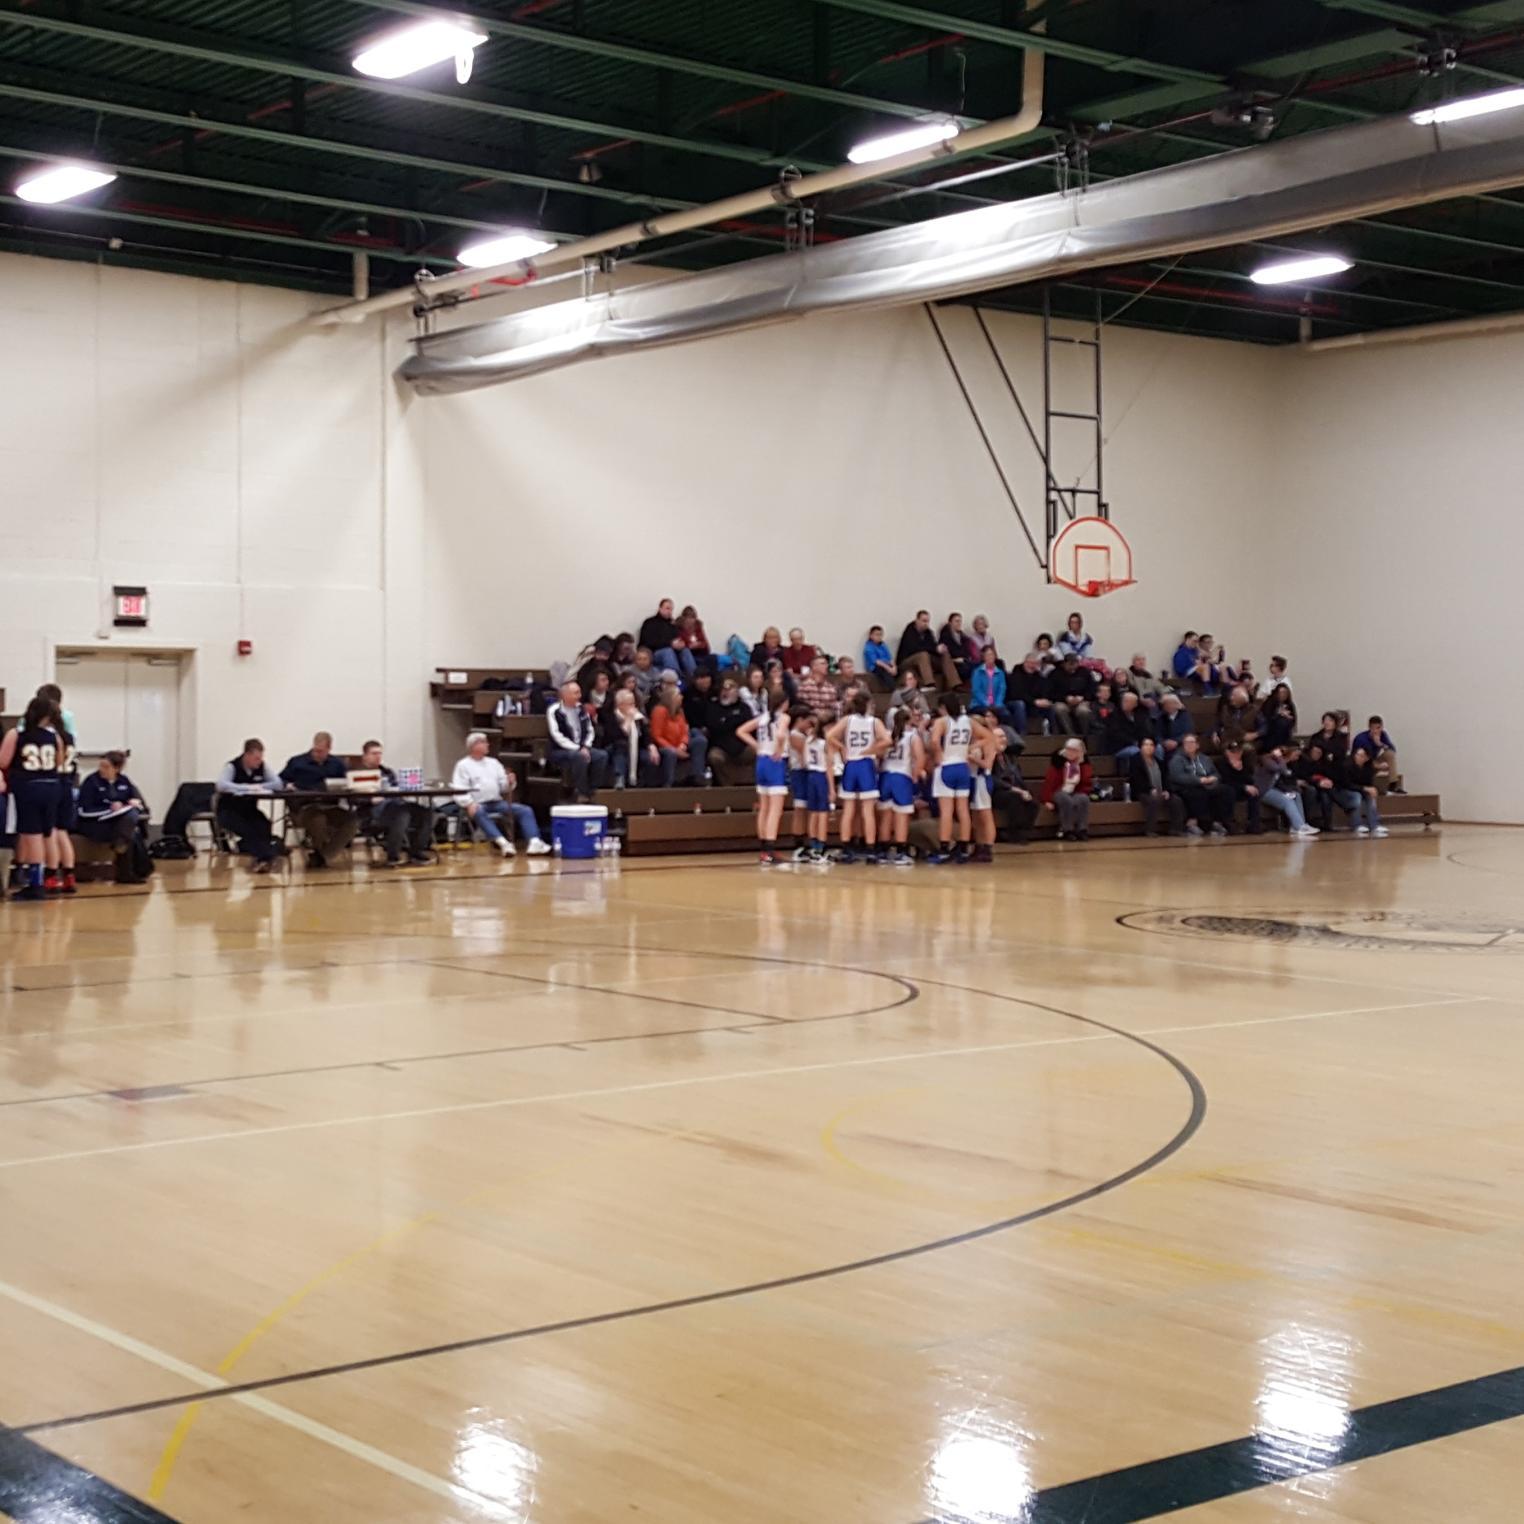 Gymnasium - Basketball